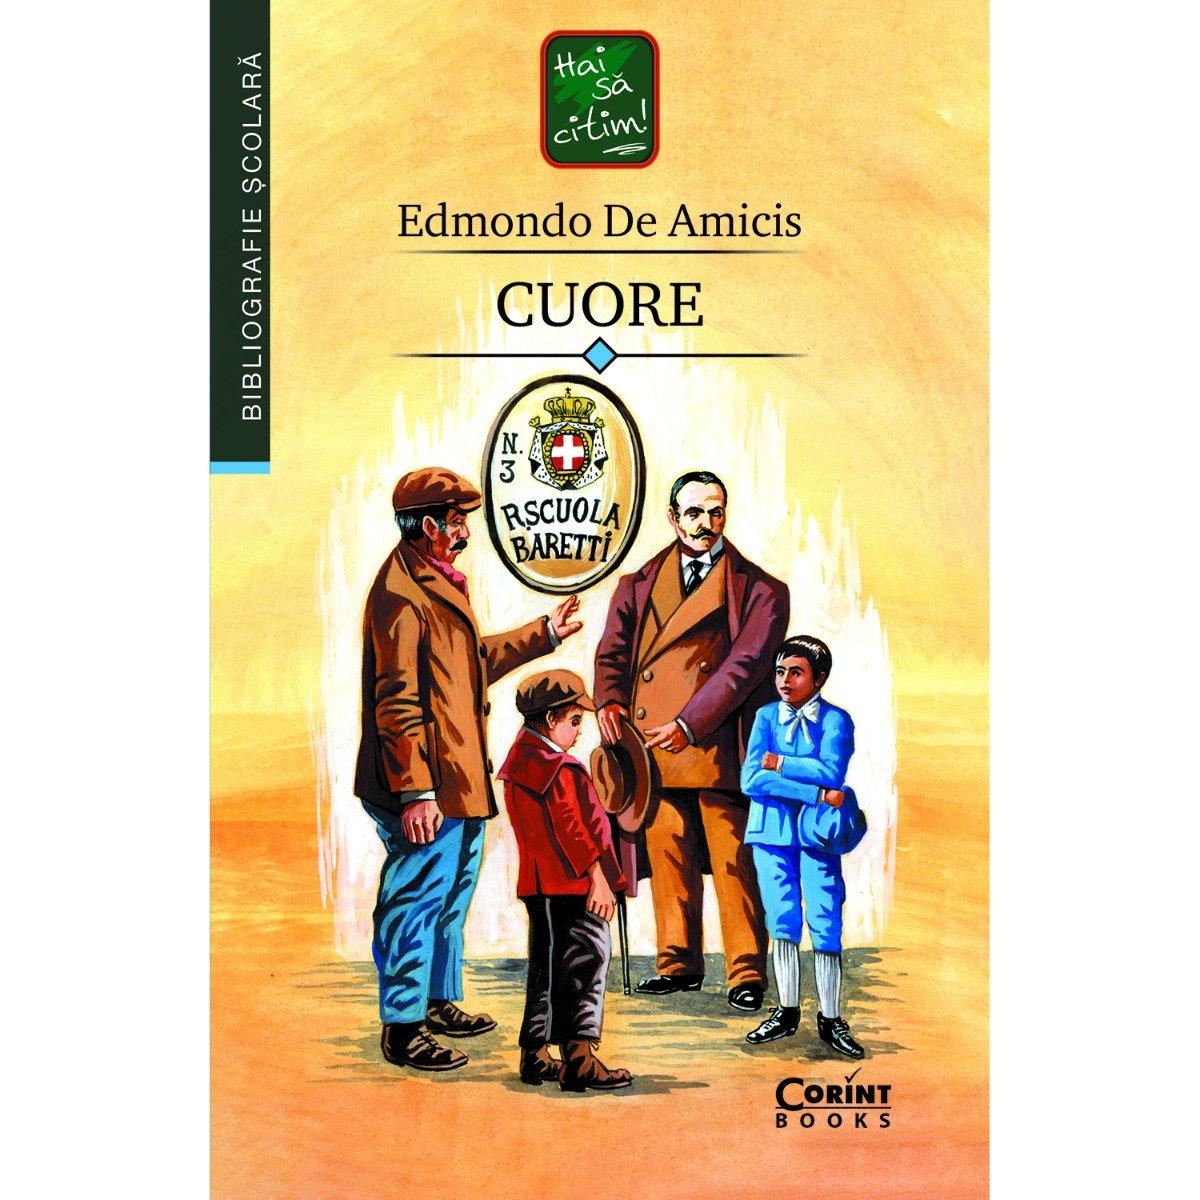 Carte Editura Corint, Cuore, Edmondo De Amicis